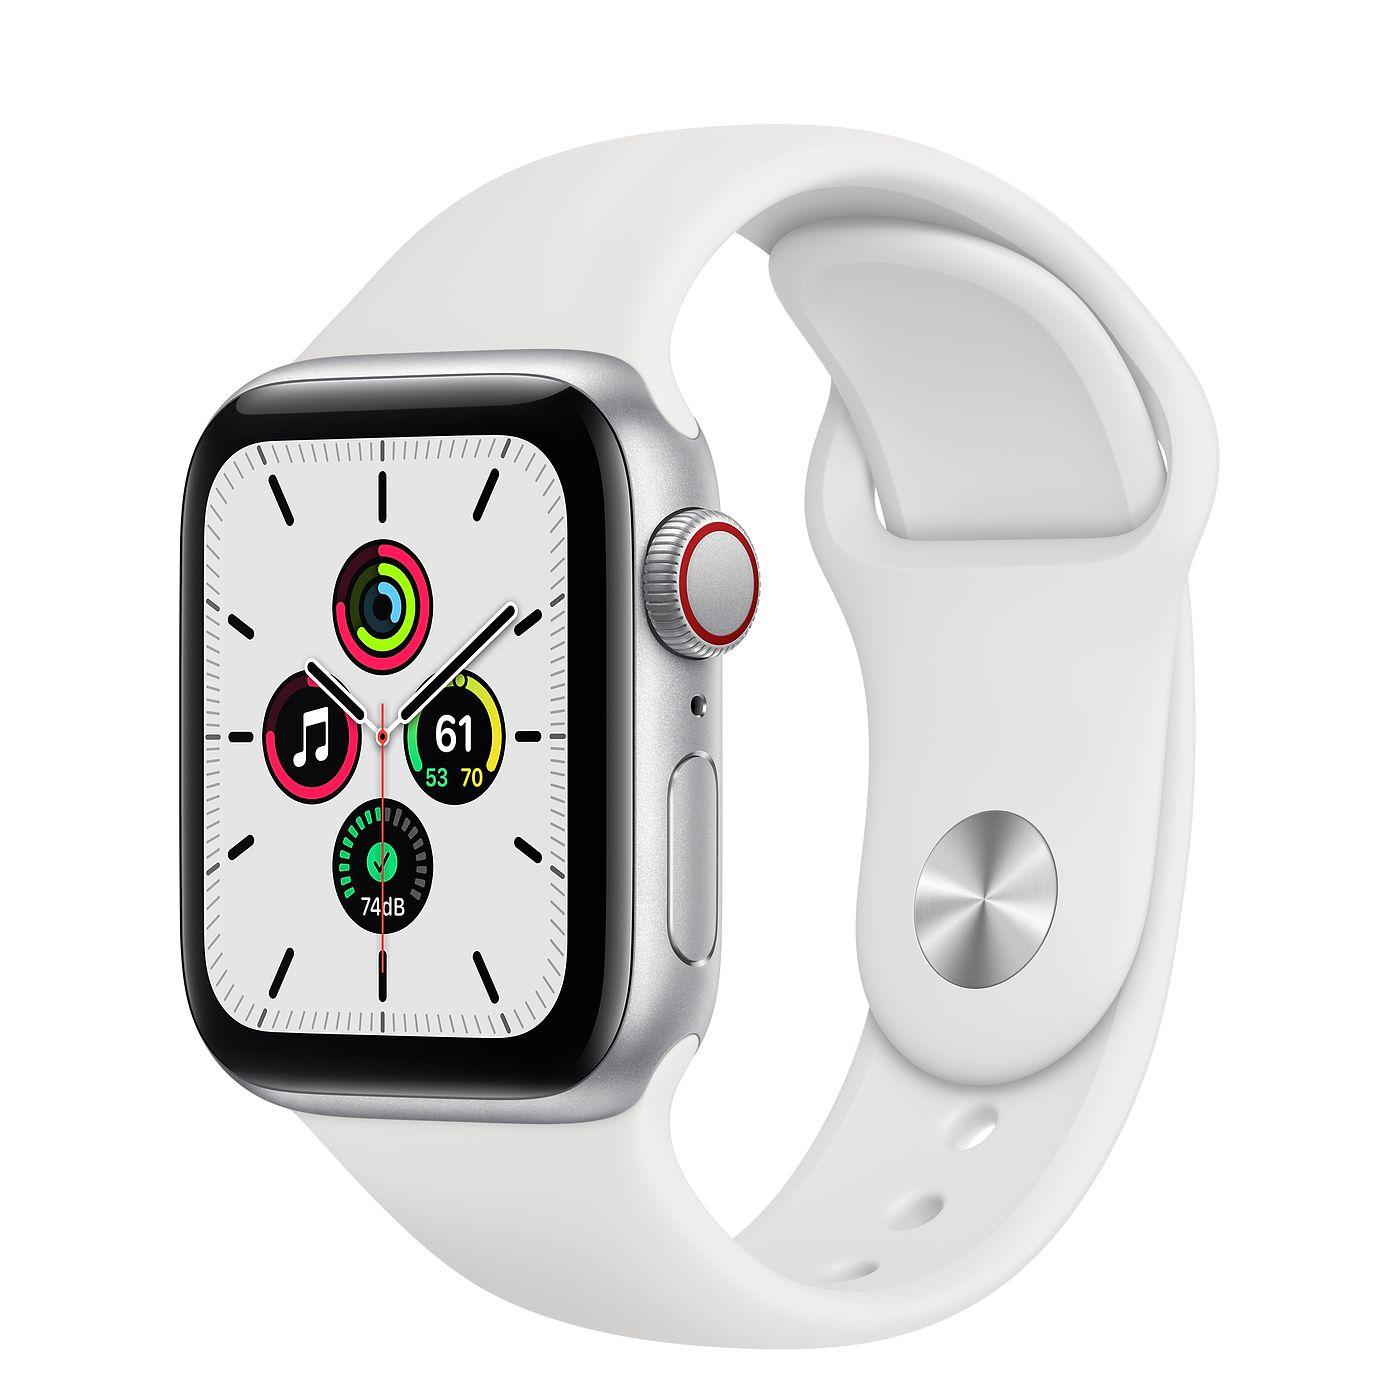 Apple 2020년 애플워치 SE, GPS+Cellular, 실버 알루미늄 케이스, 화이트 스포츠 밴드